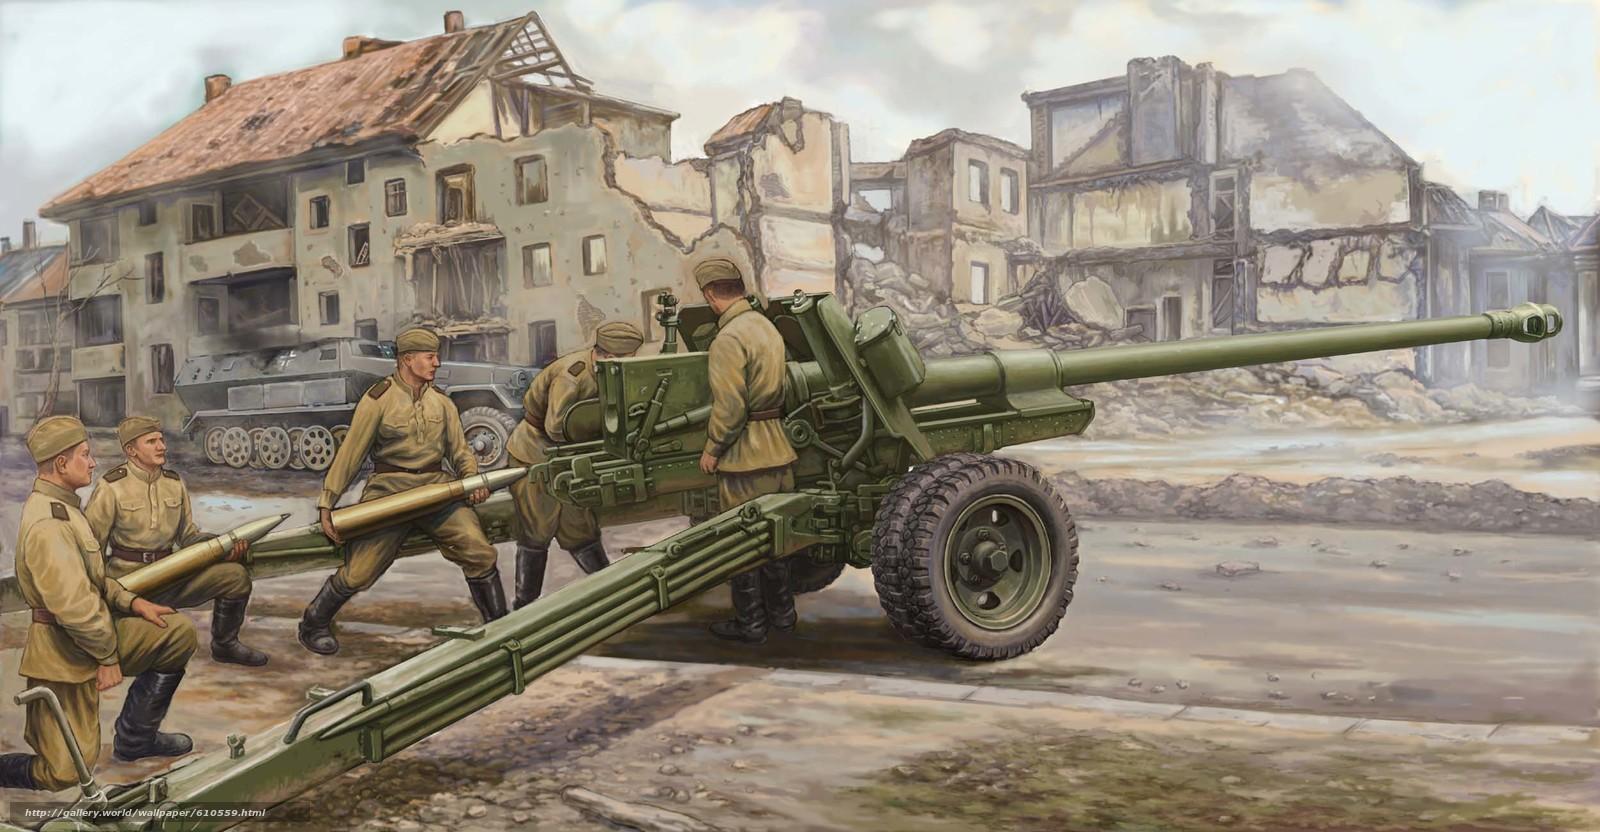 Baixar Wallpaper Arte,  pistola,  soldados,  URSS Papis de parede grtis na resoluo 2500x1300 — quadro №610559